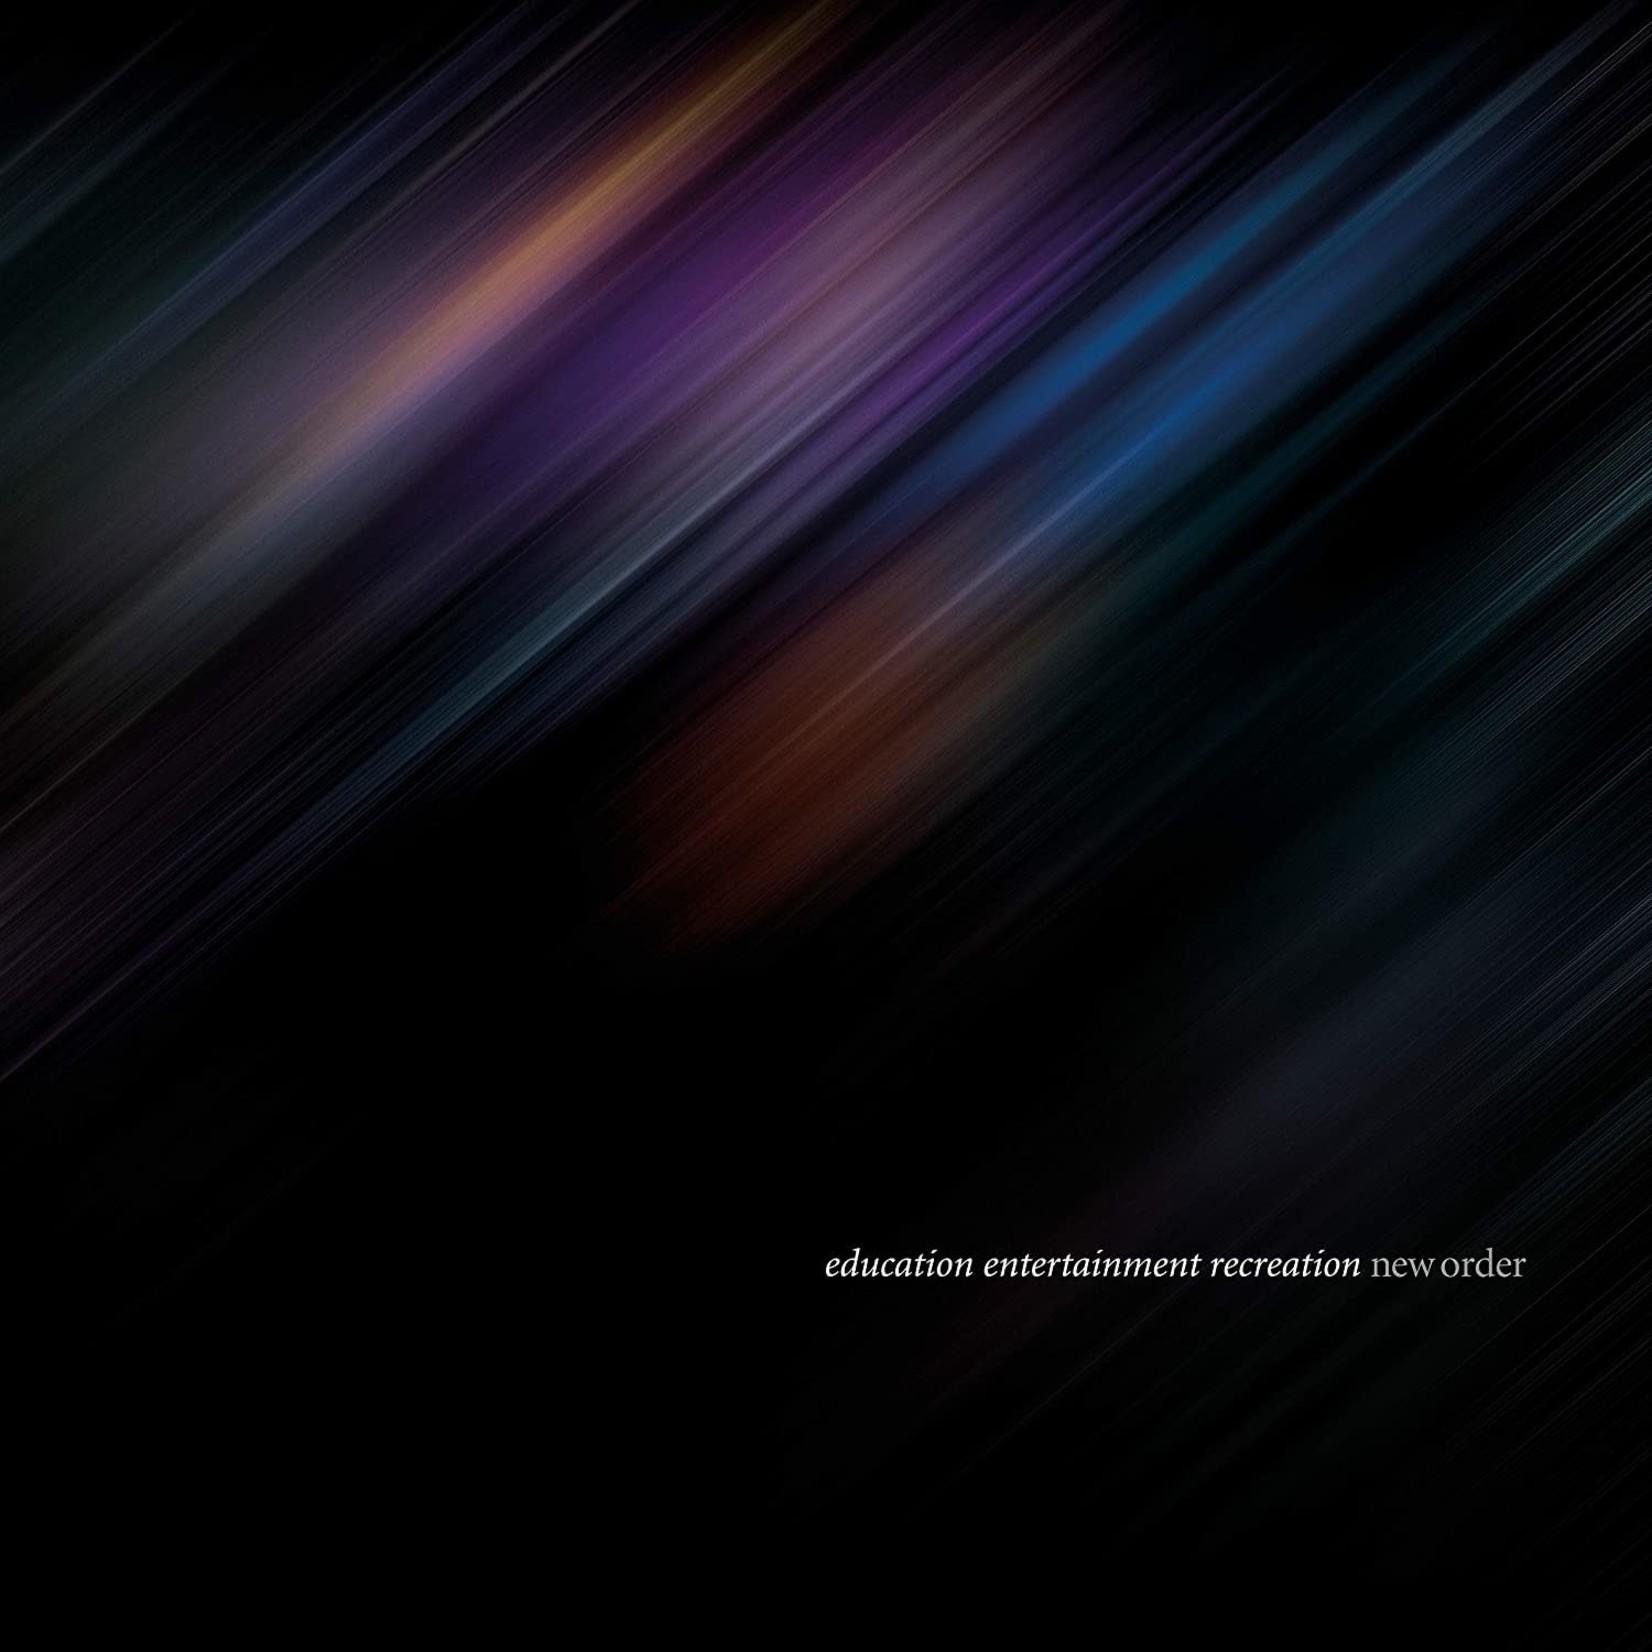 [New] New Order: Education Entertainment Recreation (3LP)